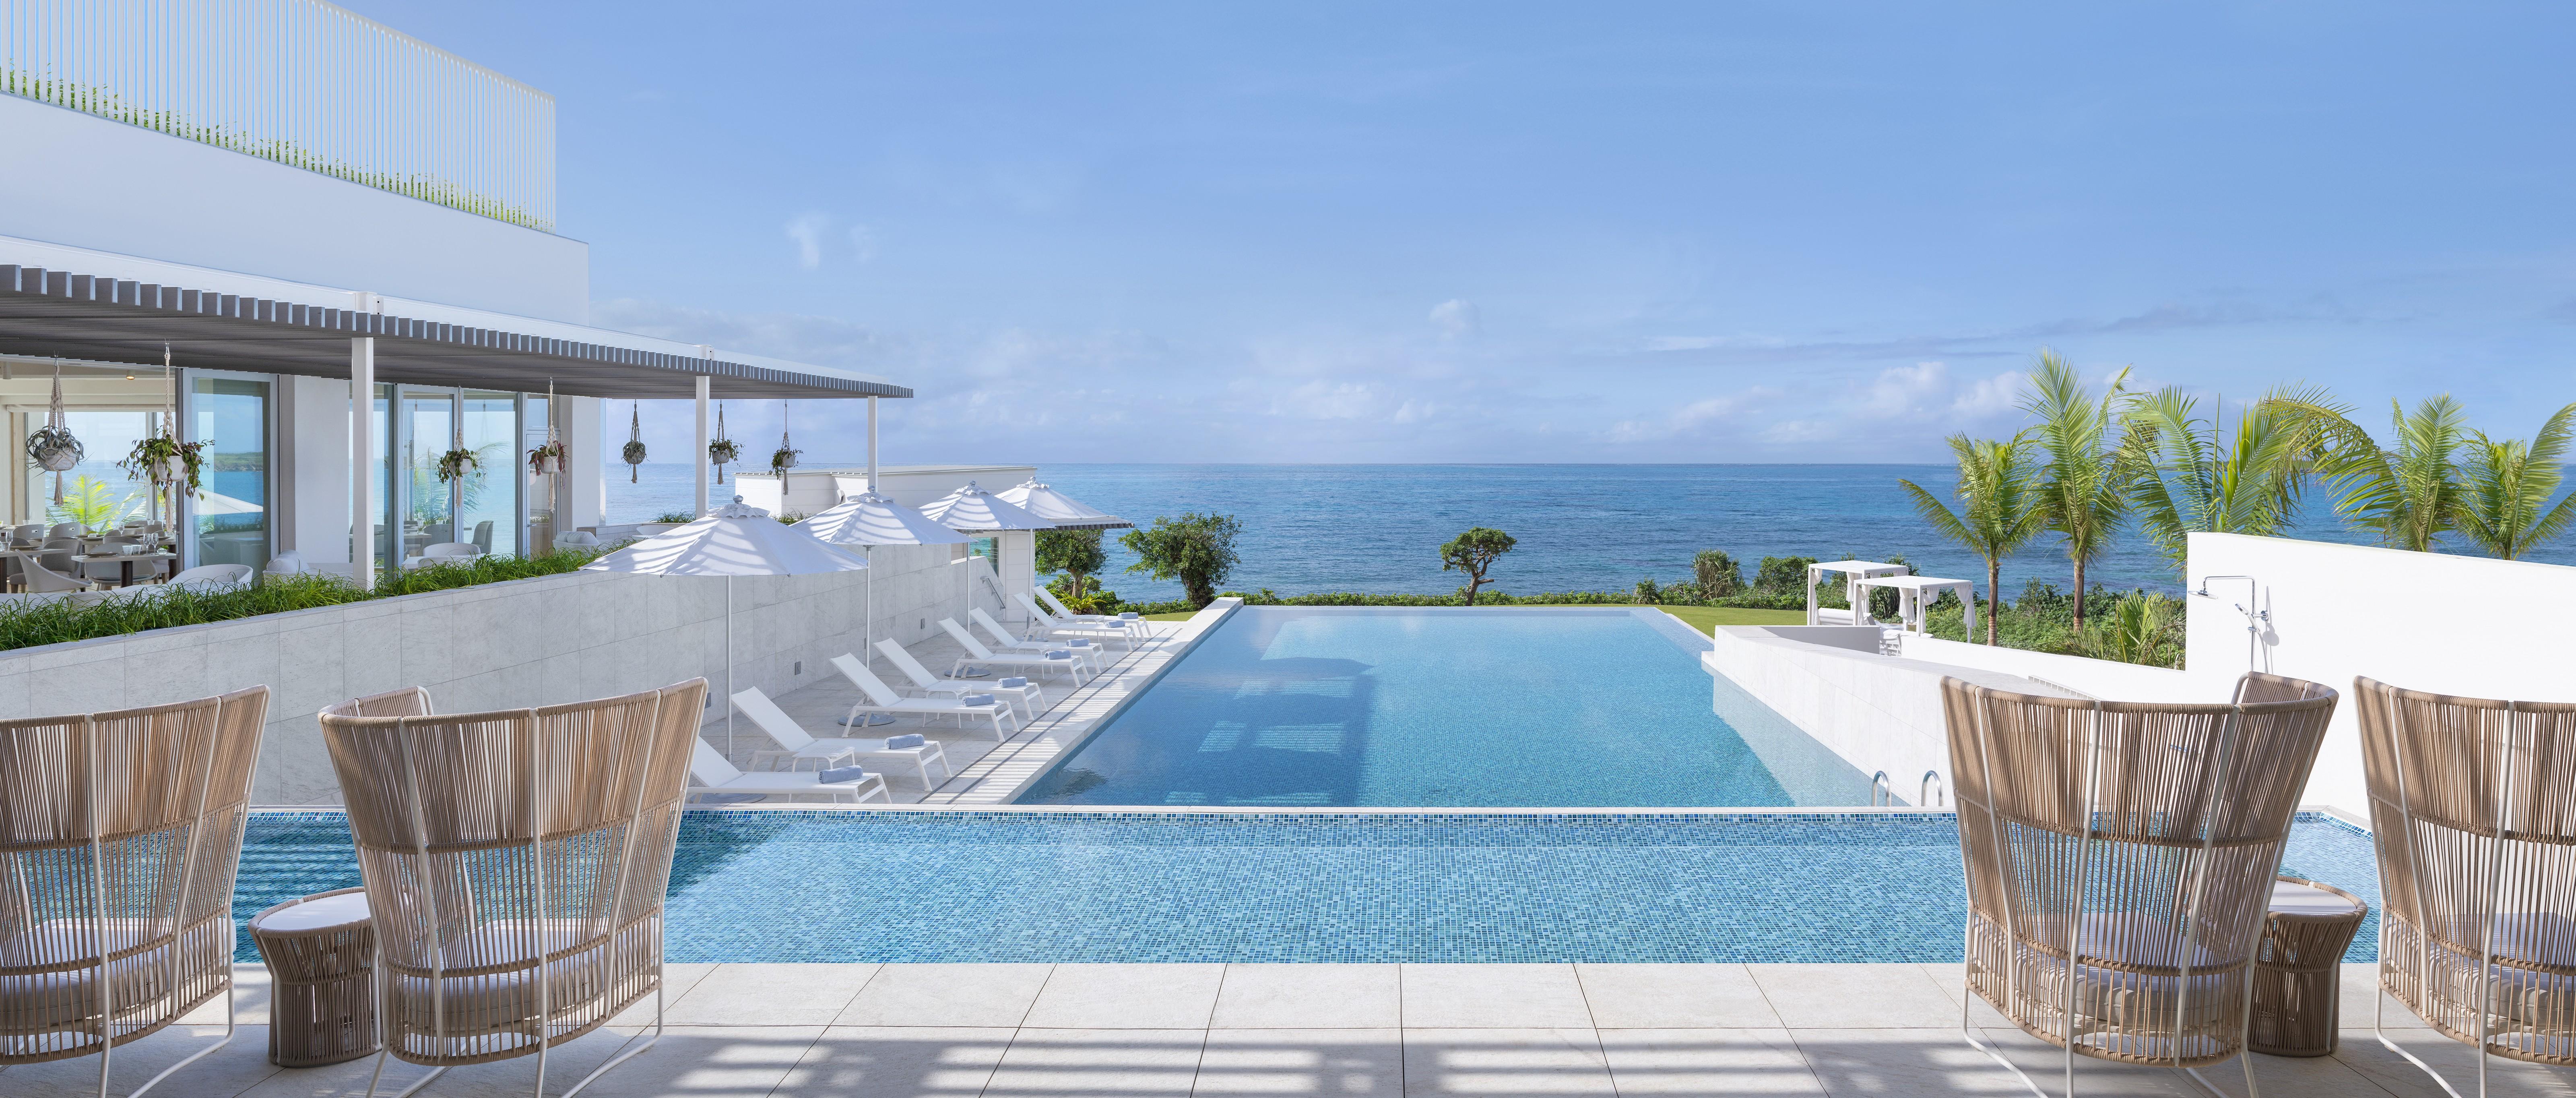 Marriott opens first international luxury hotel on Japan's remote